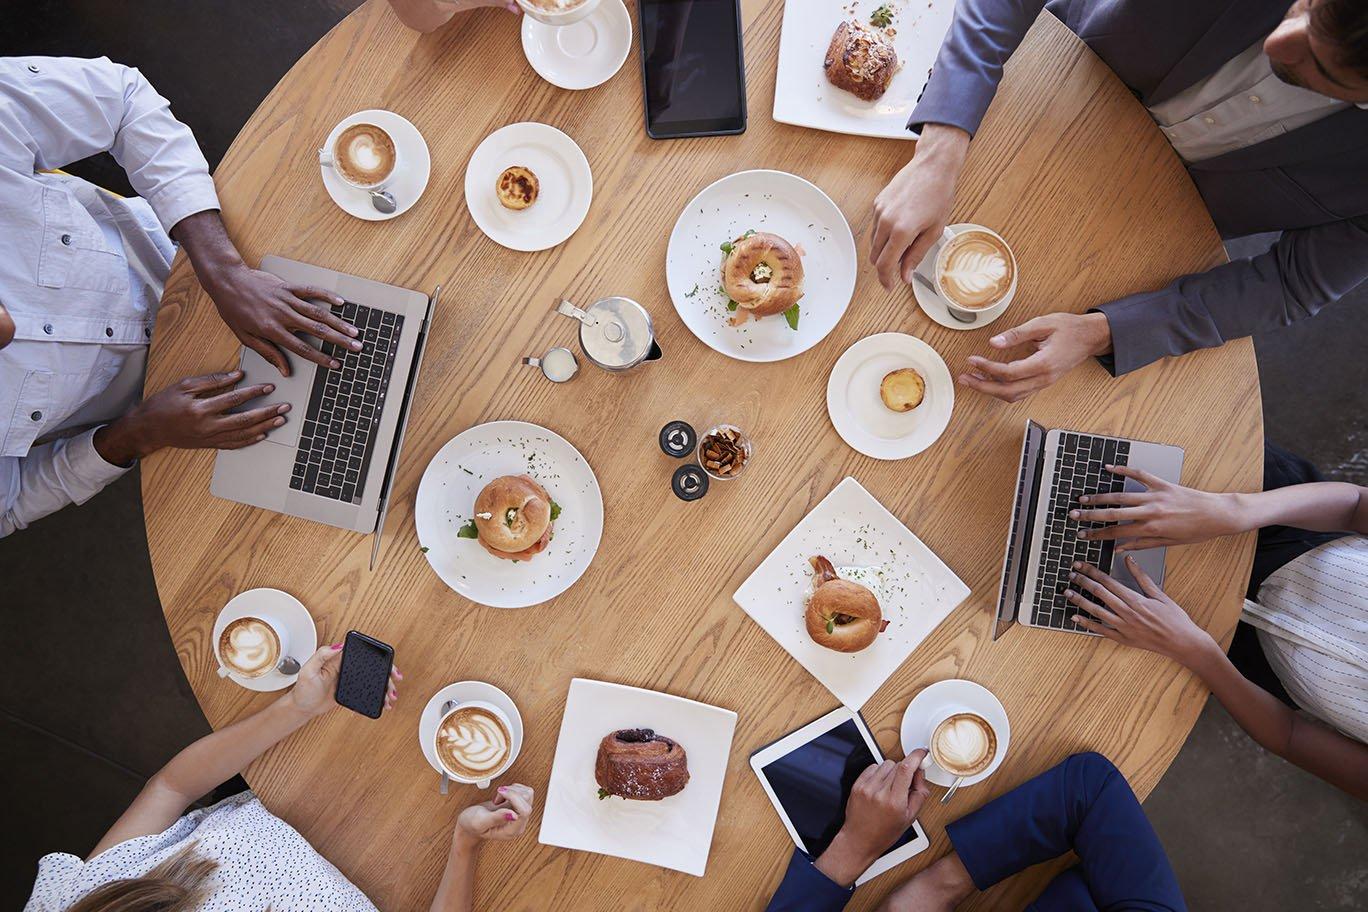 Cafe meet up